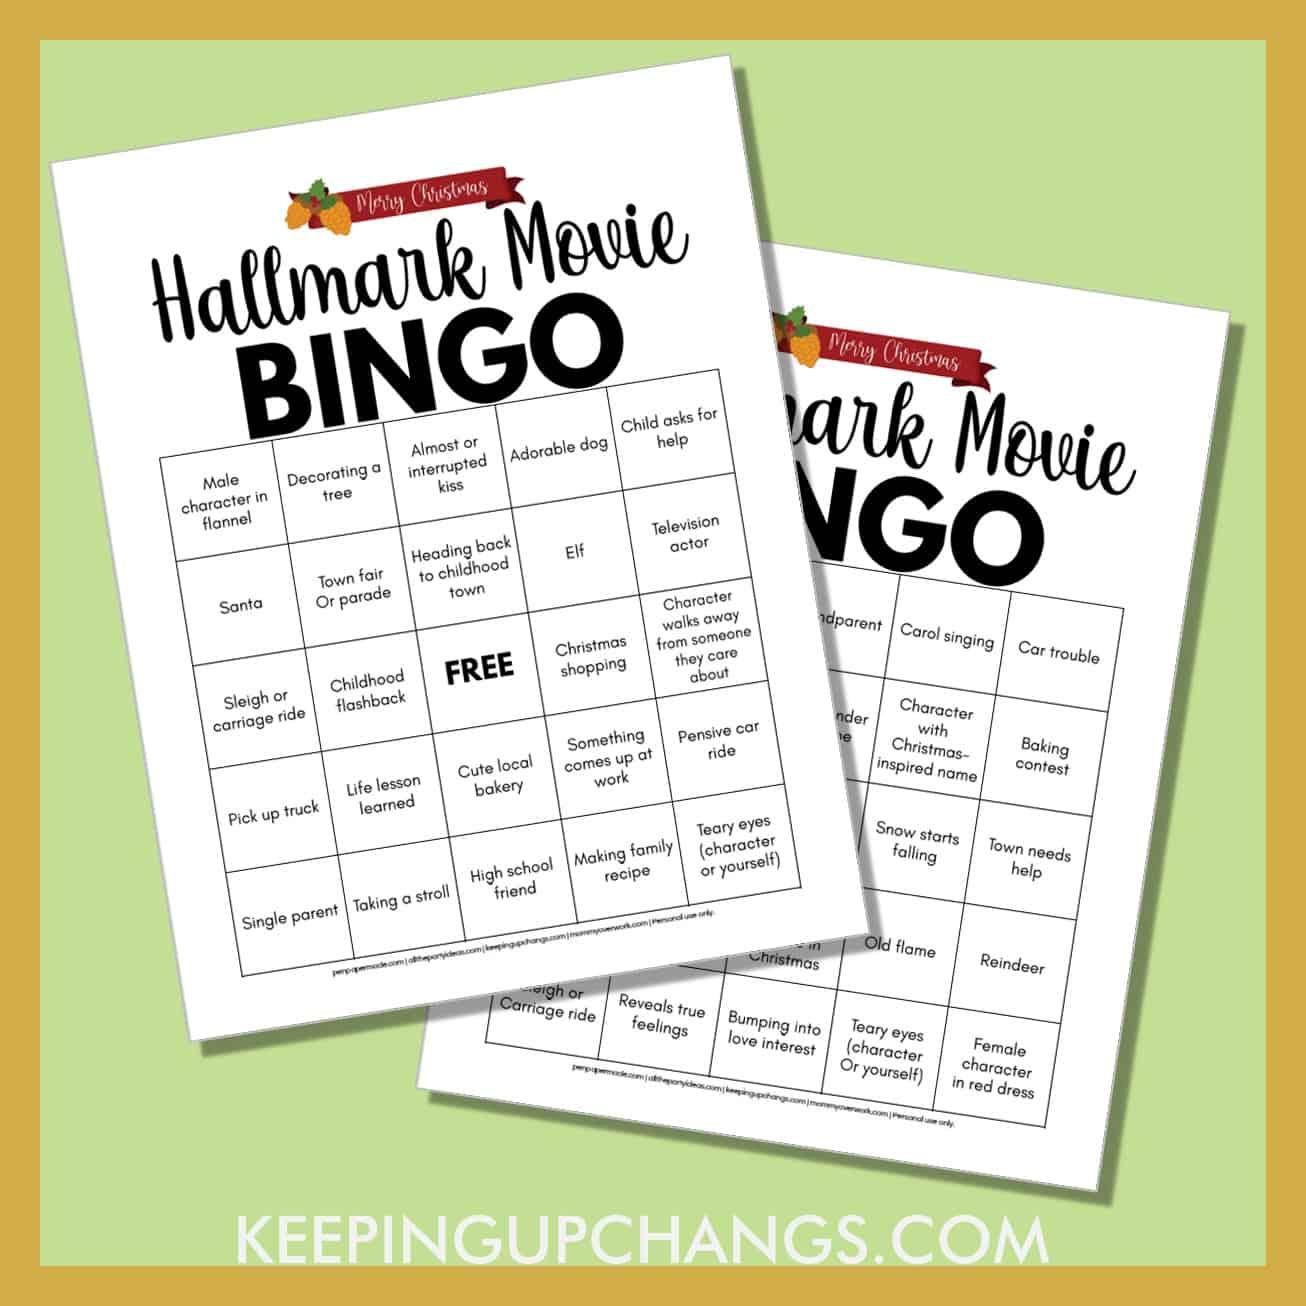 simple easy christmas hallmark movie bingo with free printable in 4 versions.